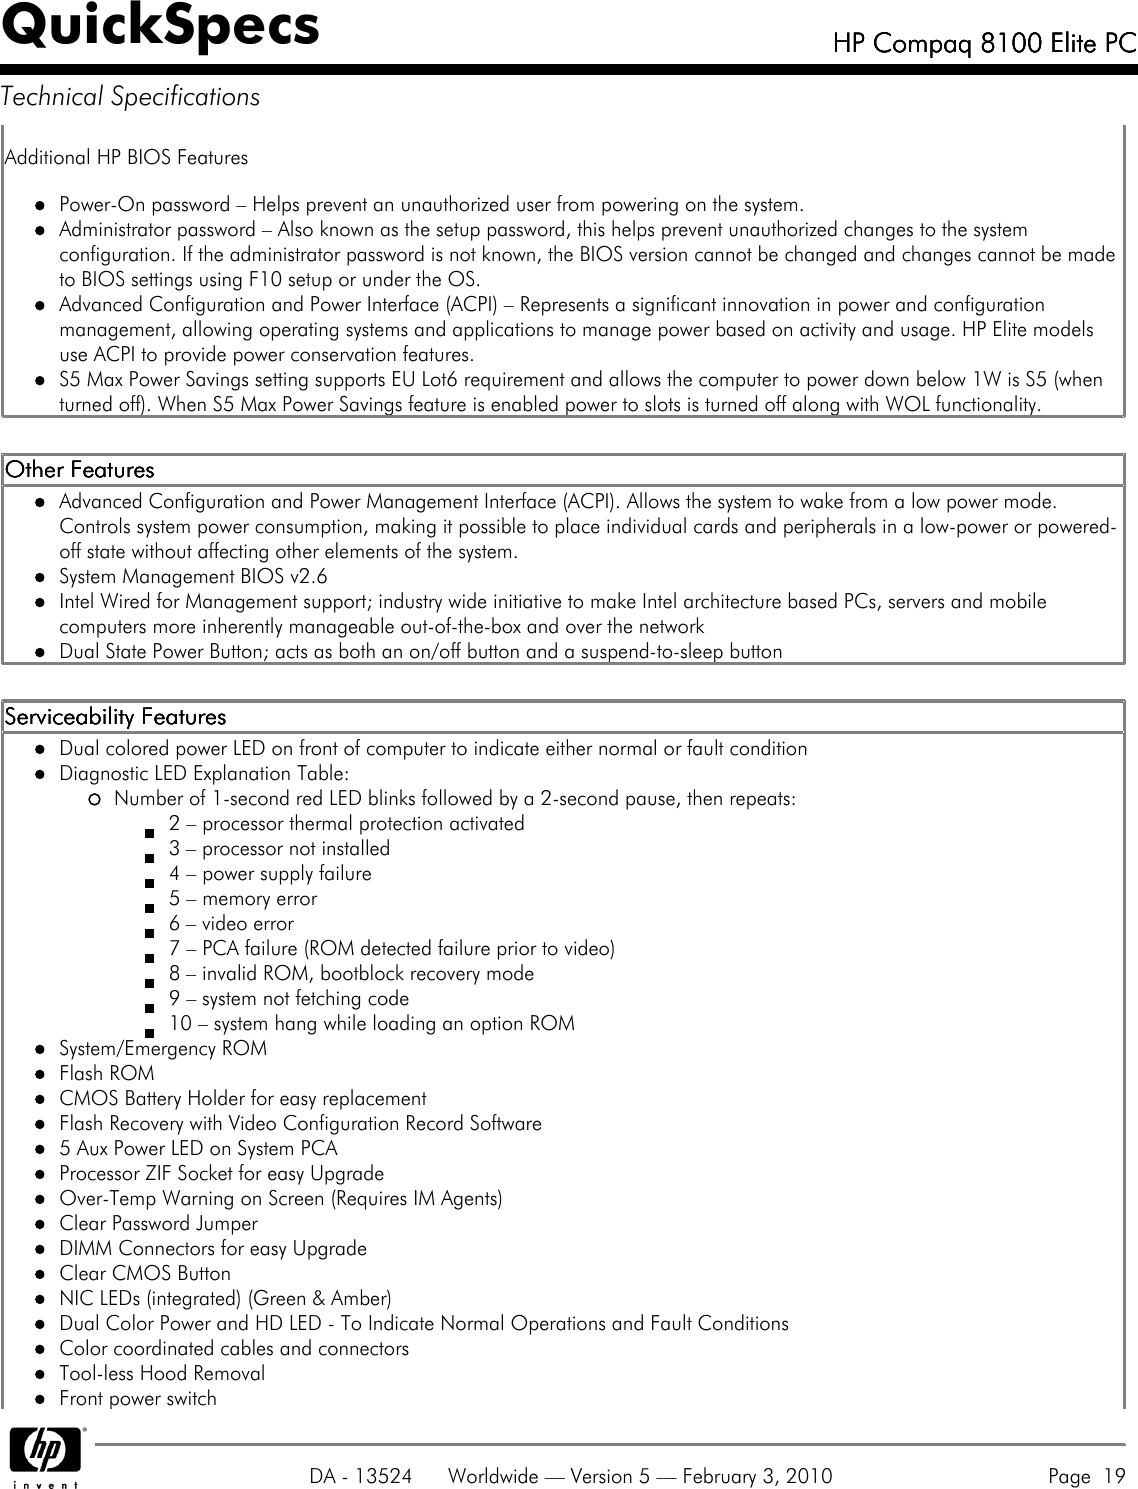 Compaq 8100 Users Manual HP Elite PC